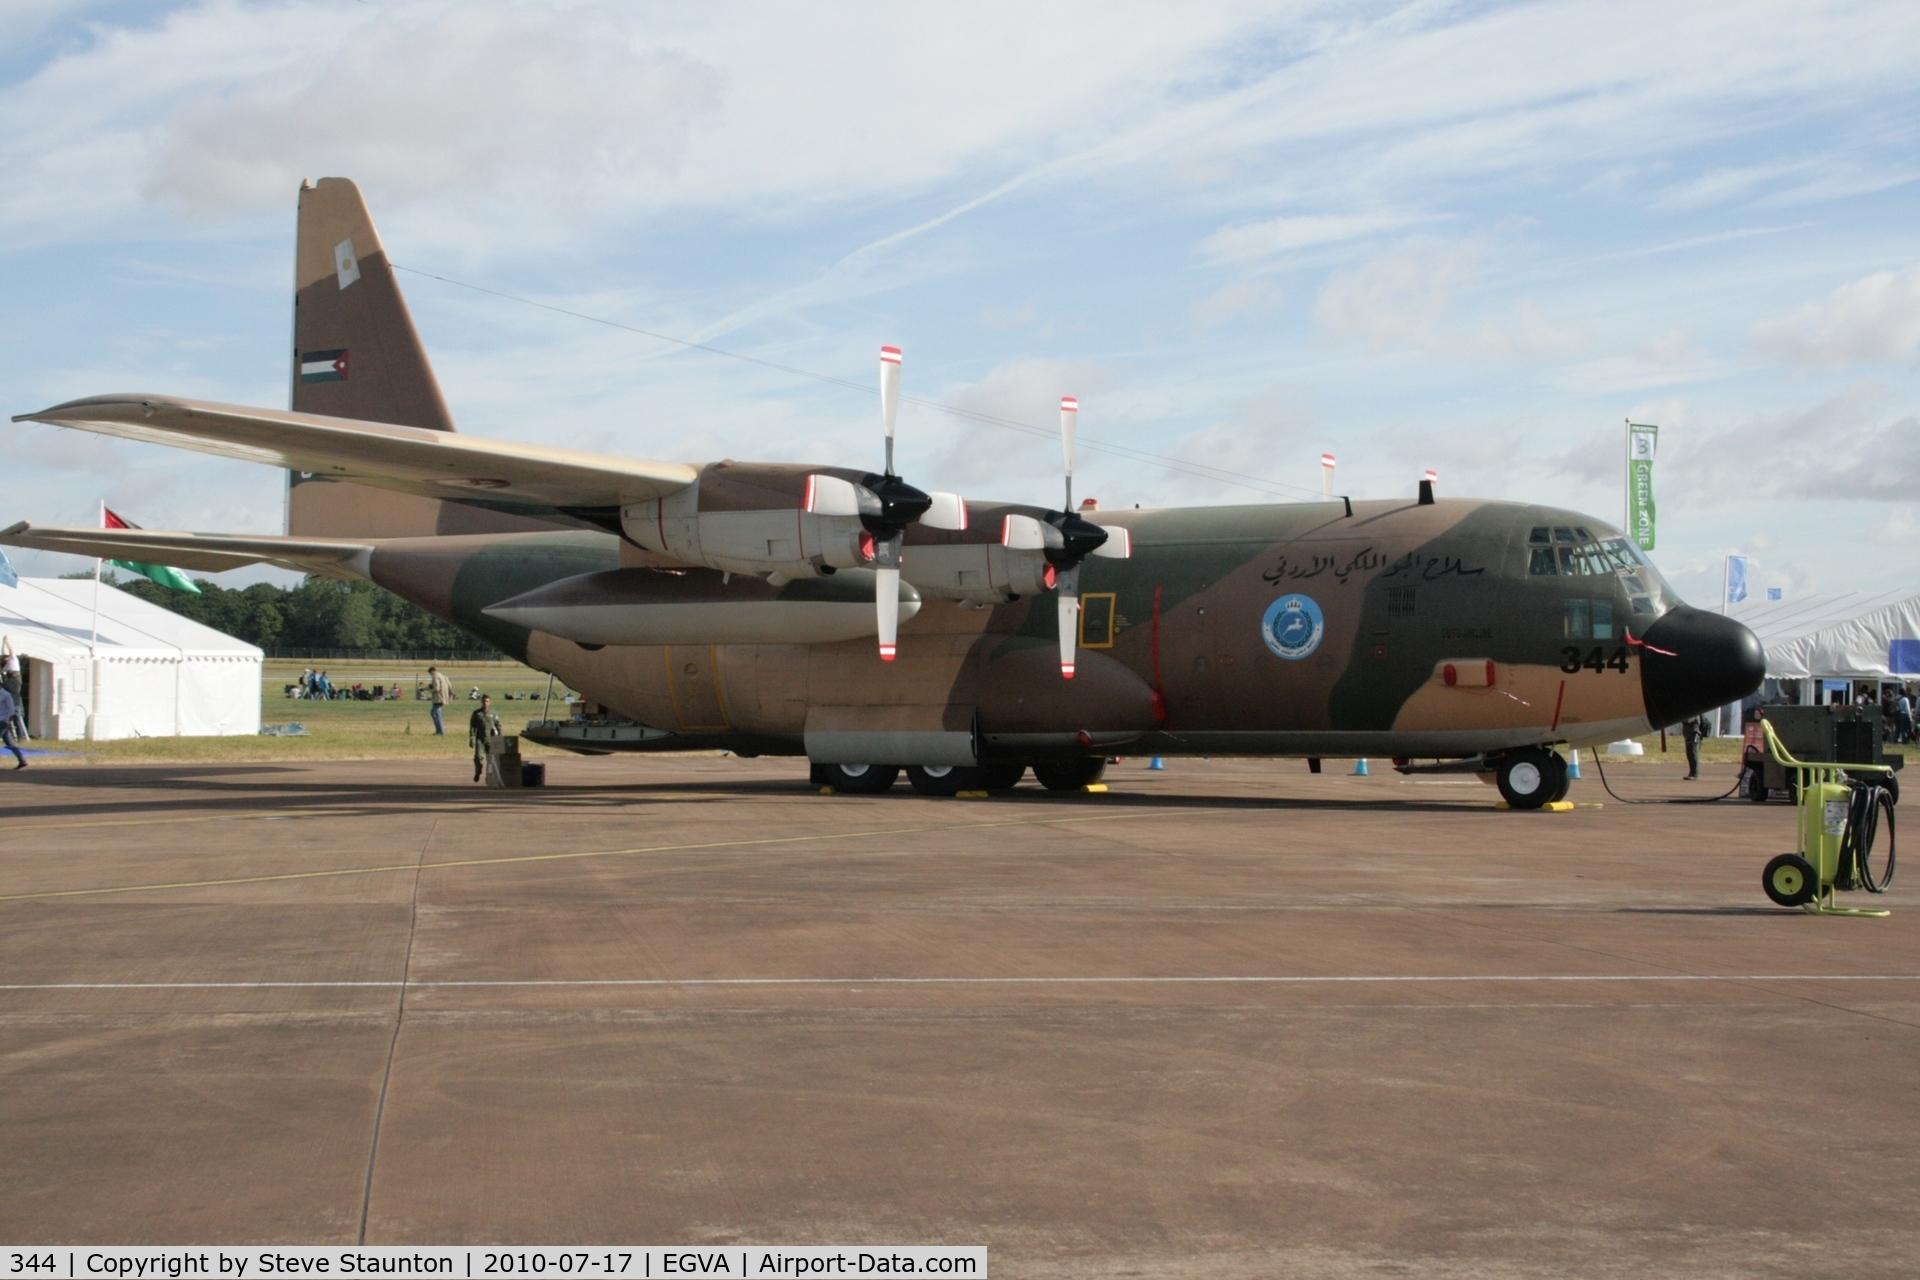 344, 1978 Lockheed C-130H Hercules C/N 382-4779, Taken at the Royal International Air Tattoo 2010